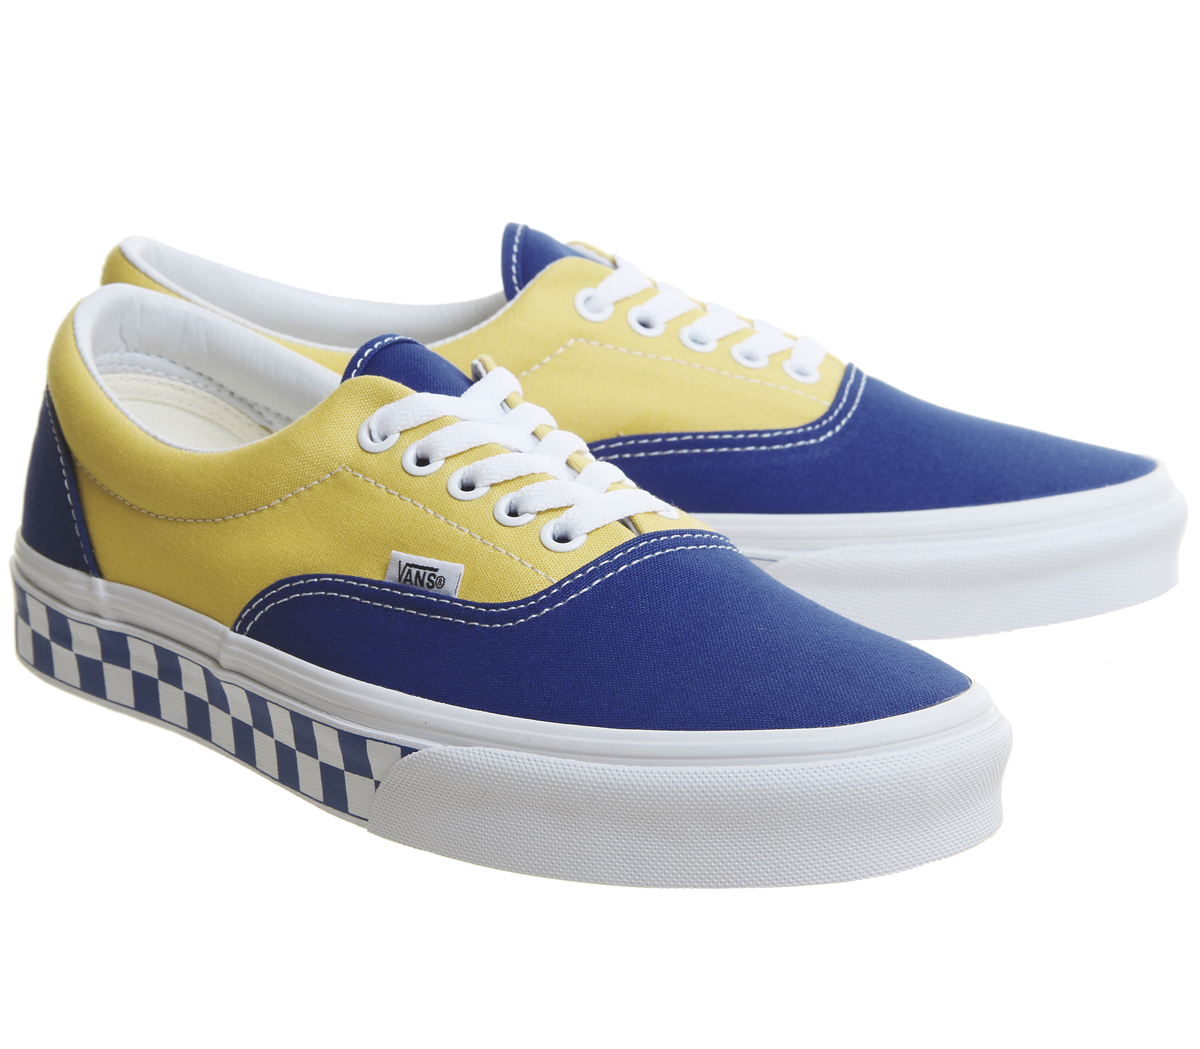 Vans Damier Era Baskets Bleu Véritable Jaune Damier Vans Baskets Chaussures 007710